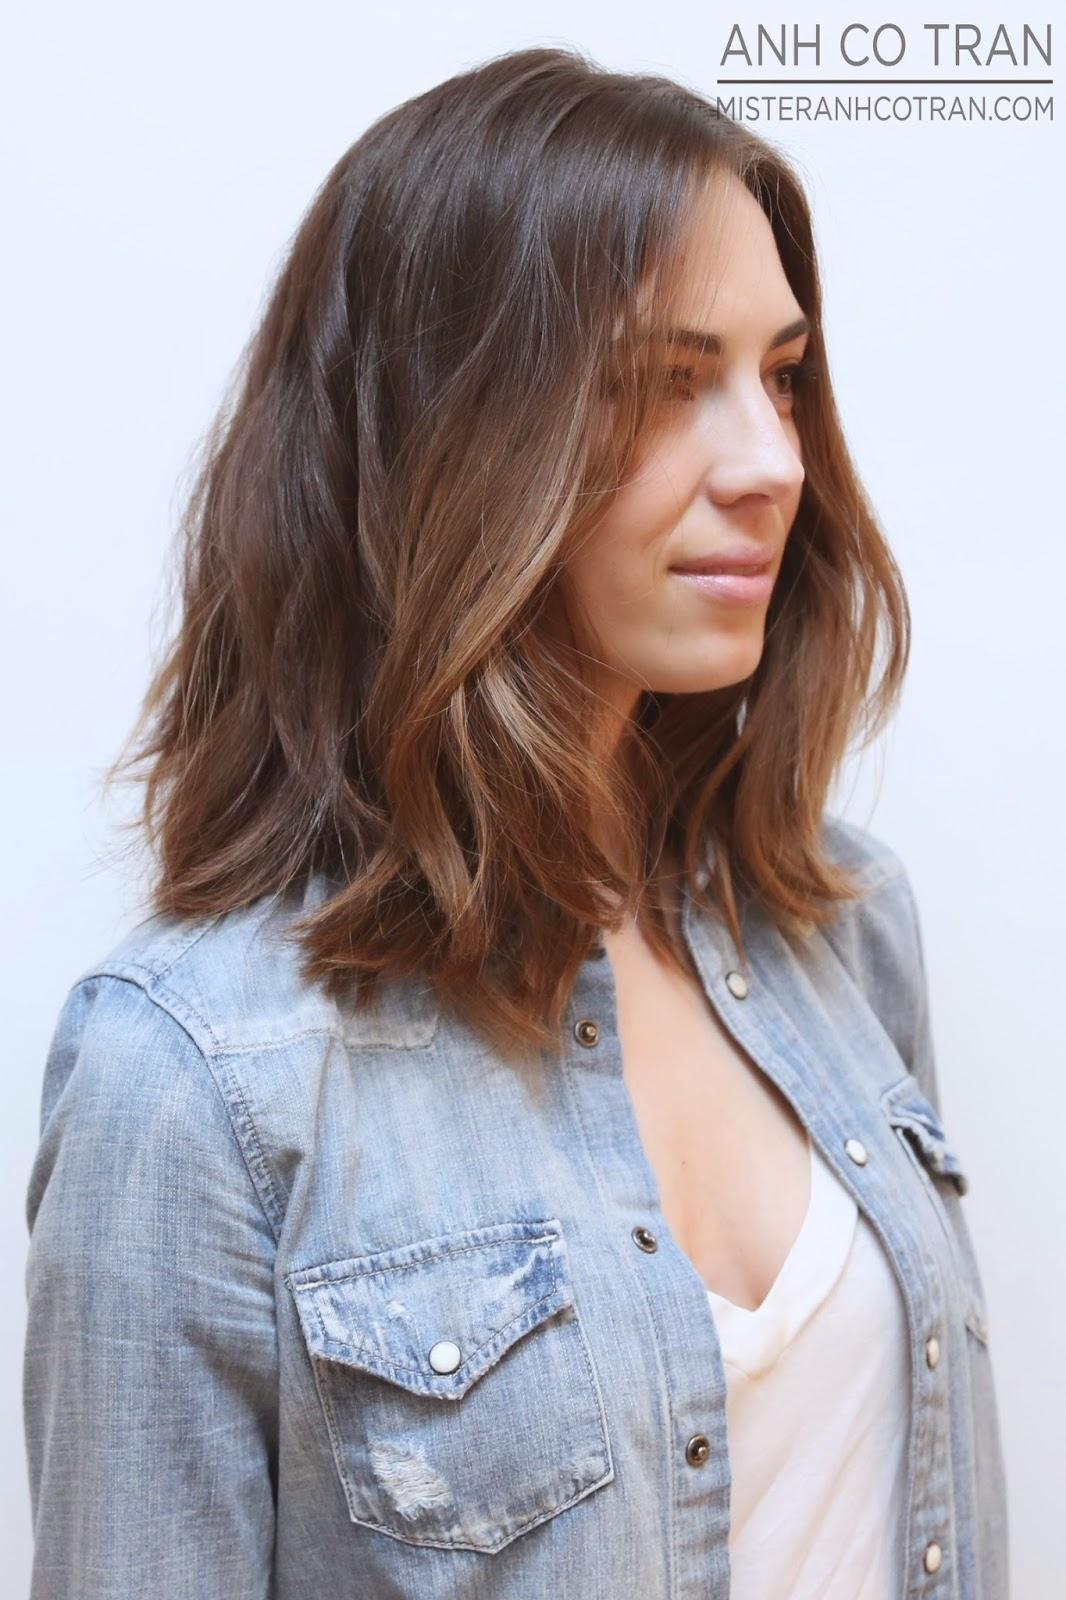 LA CHEST LENGTH HAIR TO SHOULDER LENGTH AT RAMIREZTRAN